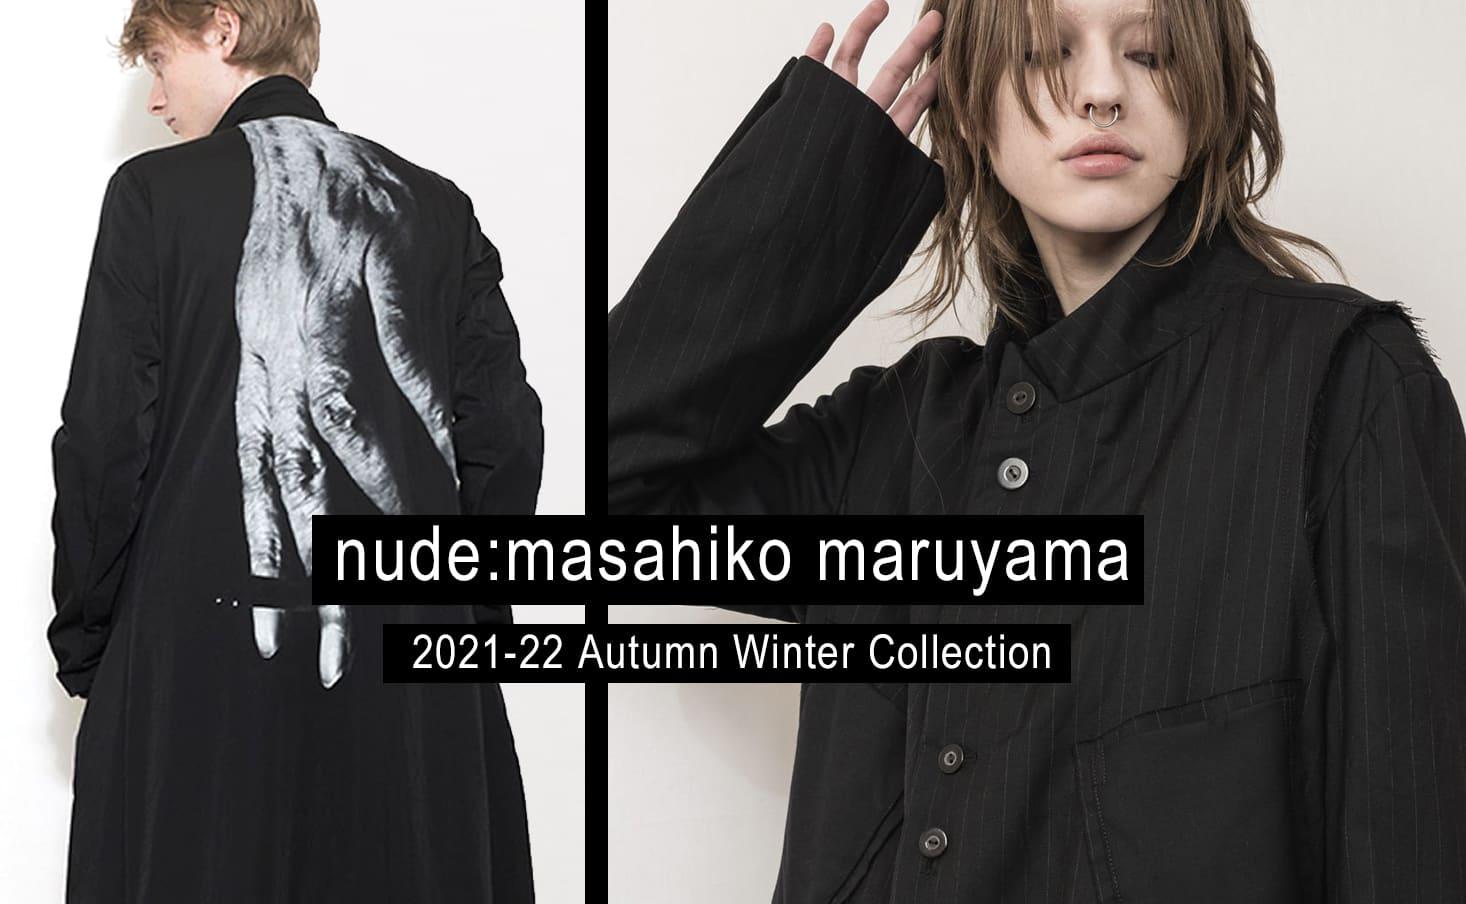 nude:masahiko maruyama(ヌード マサヒコマルヤマ) 2021-22AW(秋冬)コレクション